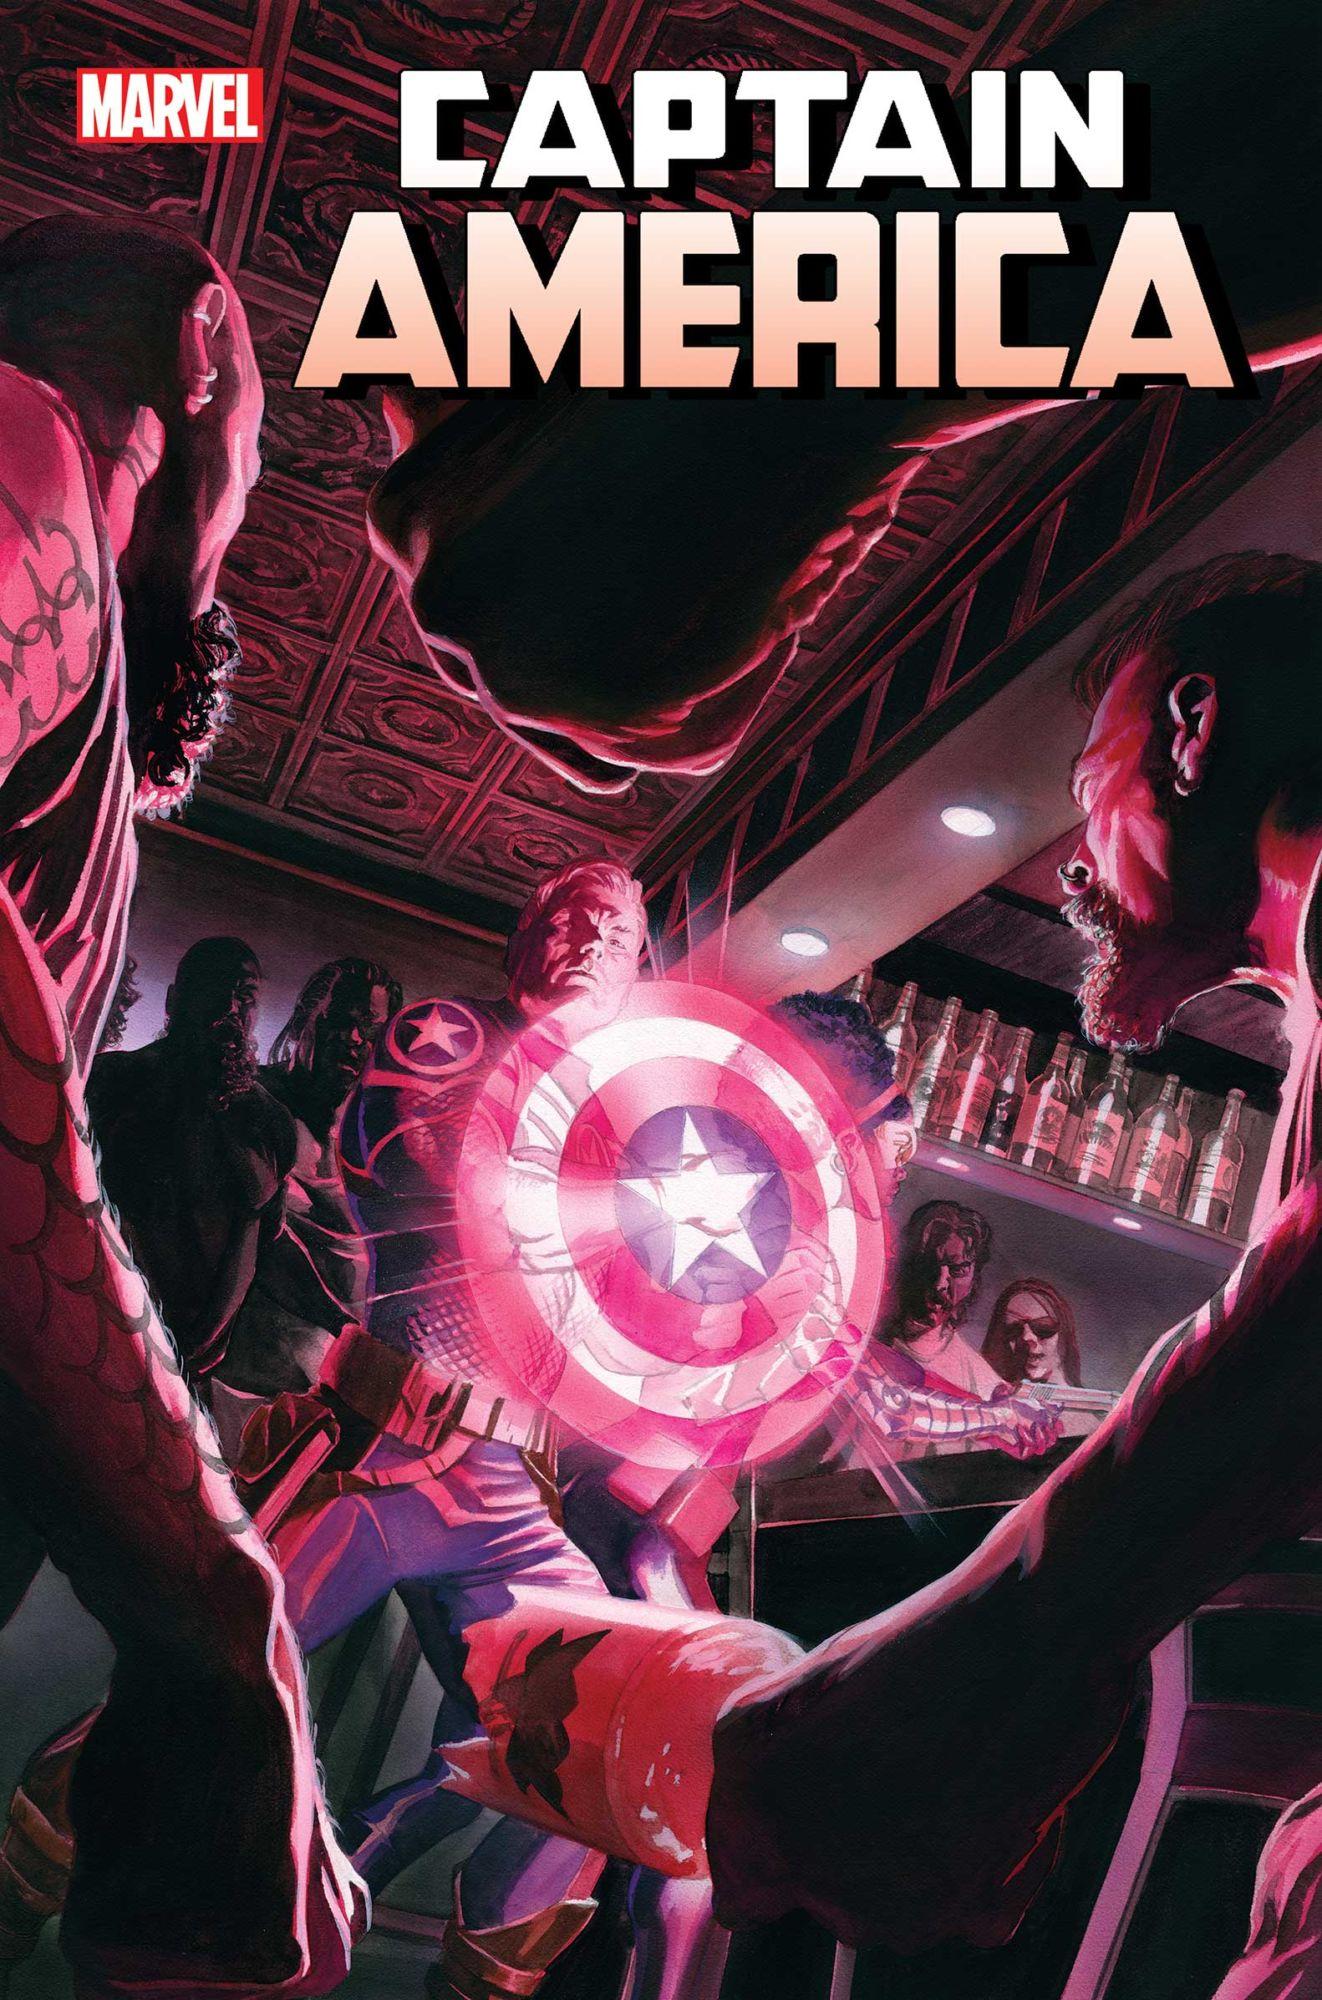 A Cop Killing Rocks New York City in Captain America #16